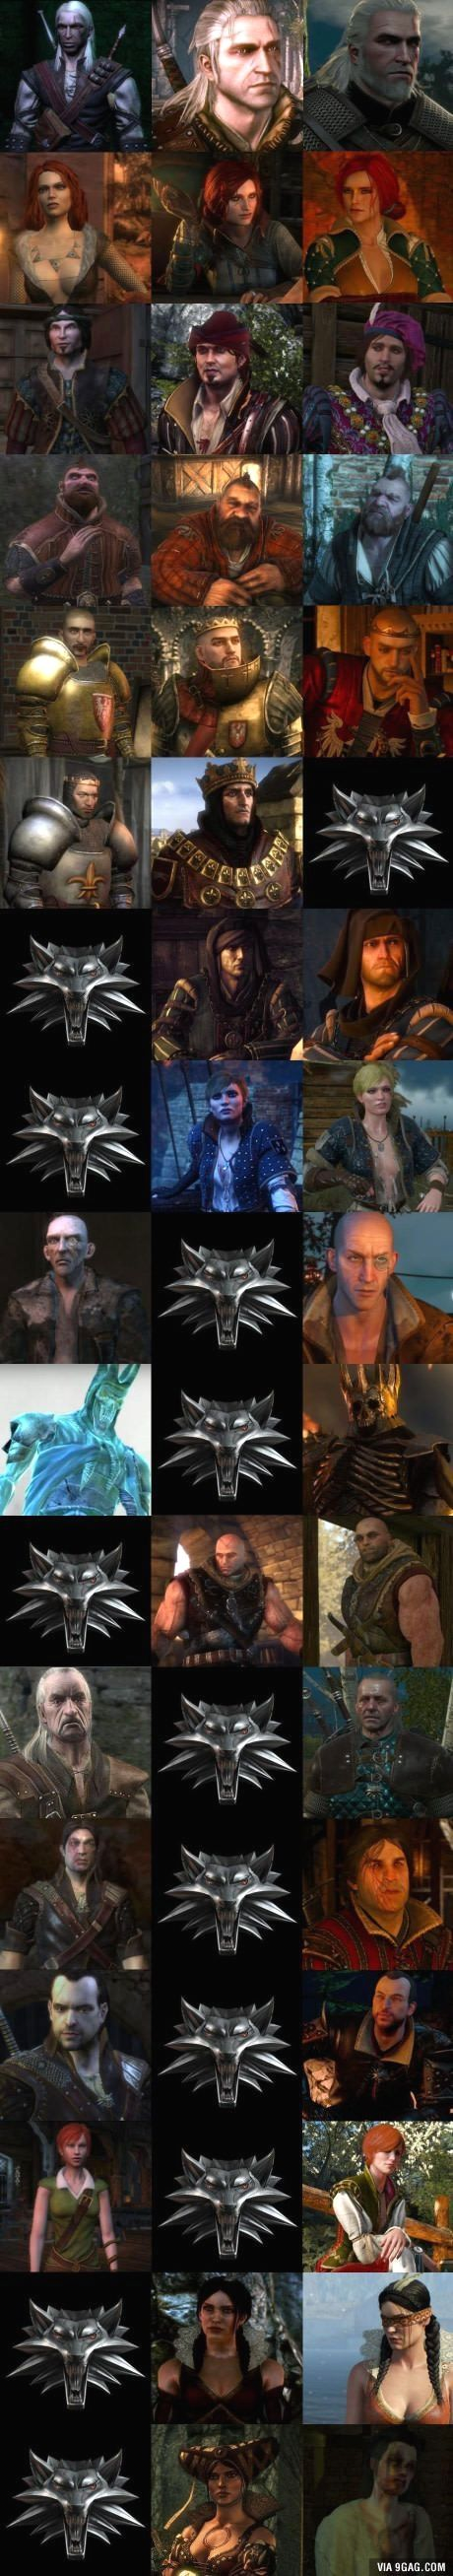 Geralt, Triss, Dandelion, Zoltan, Radovid, Foltest, Roche, Ves, Thaler, Eredin, Letho, Vesemir, Eskell, Lambert, Shani, Philippa and Síle.